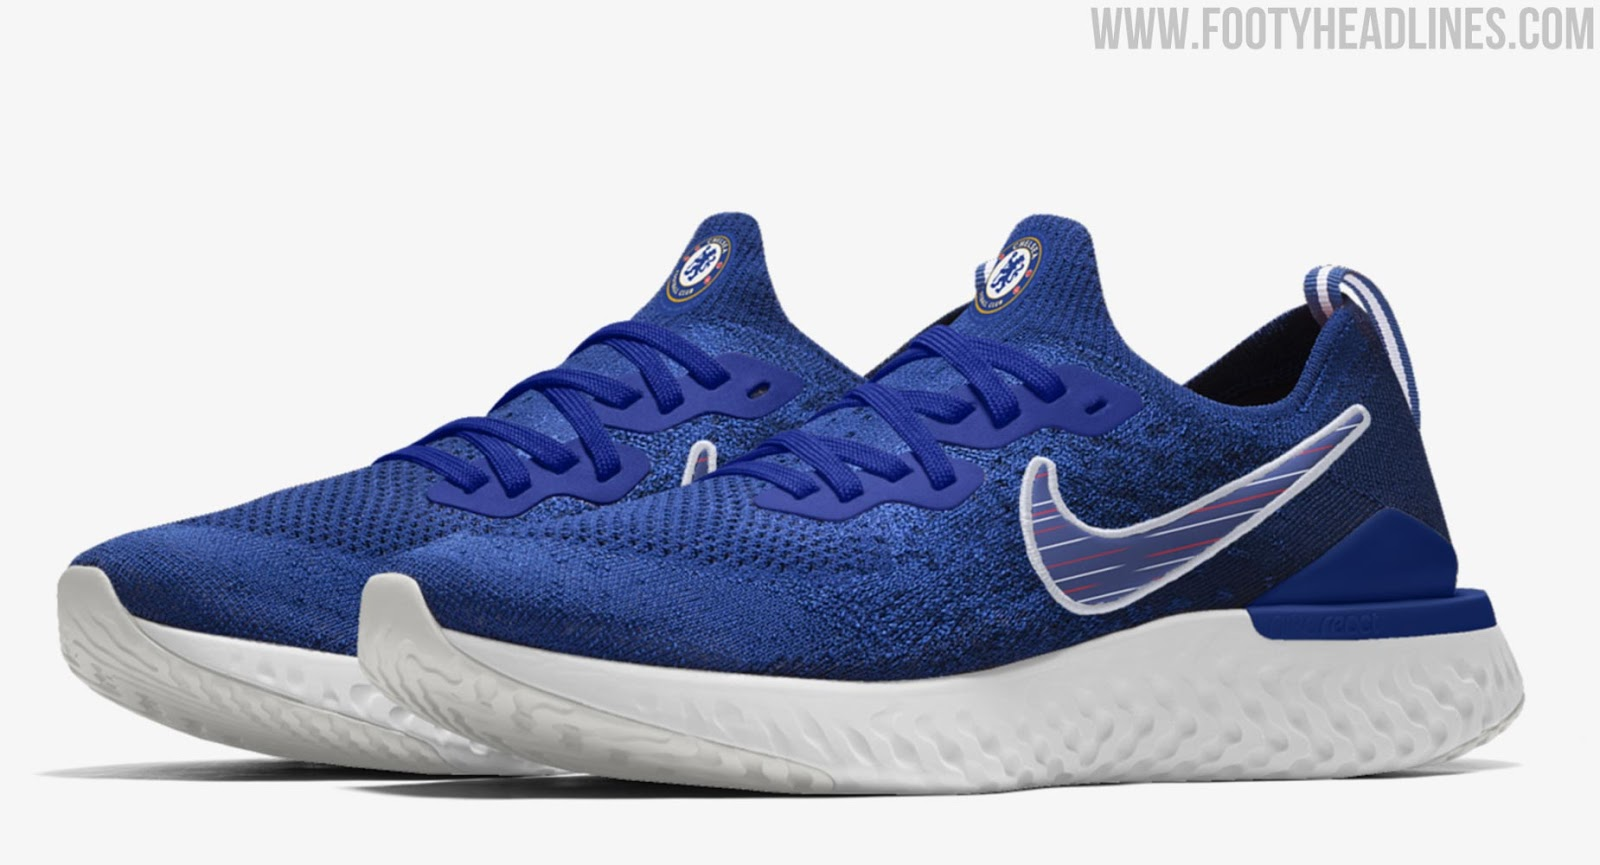 d3dd5626f9802 2 Nike Chelsea x Epic React Flyknit 2 Shoes Released - Footy ...